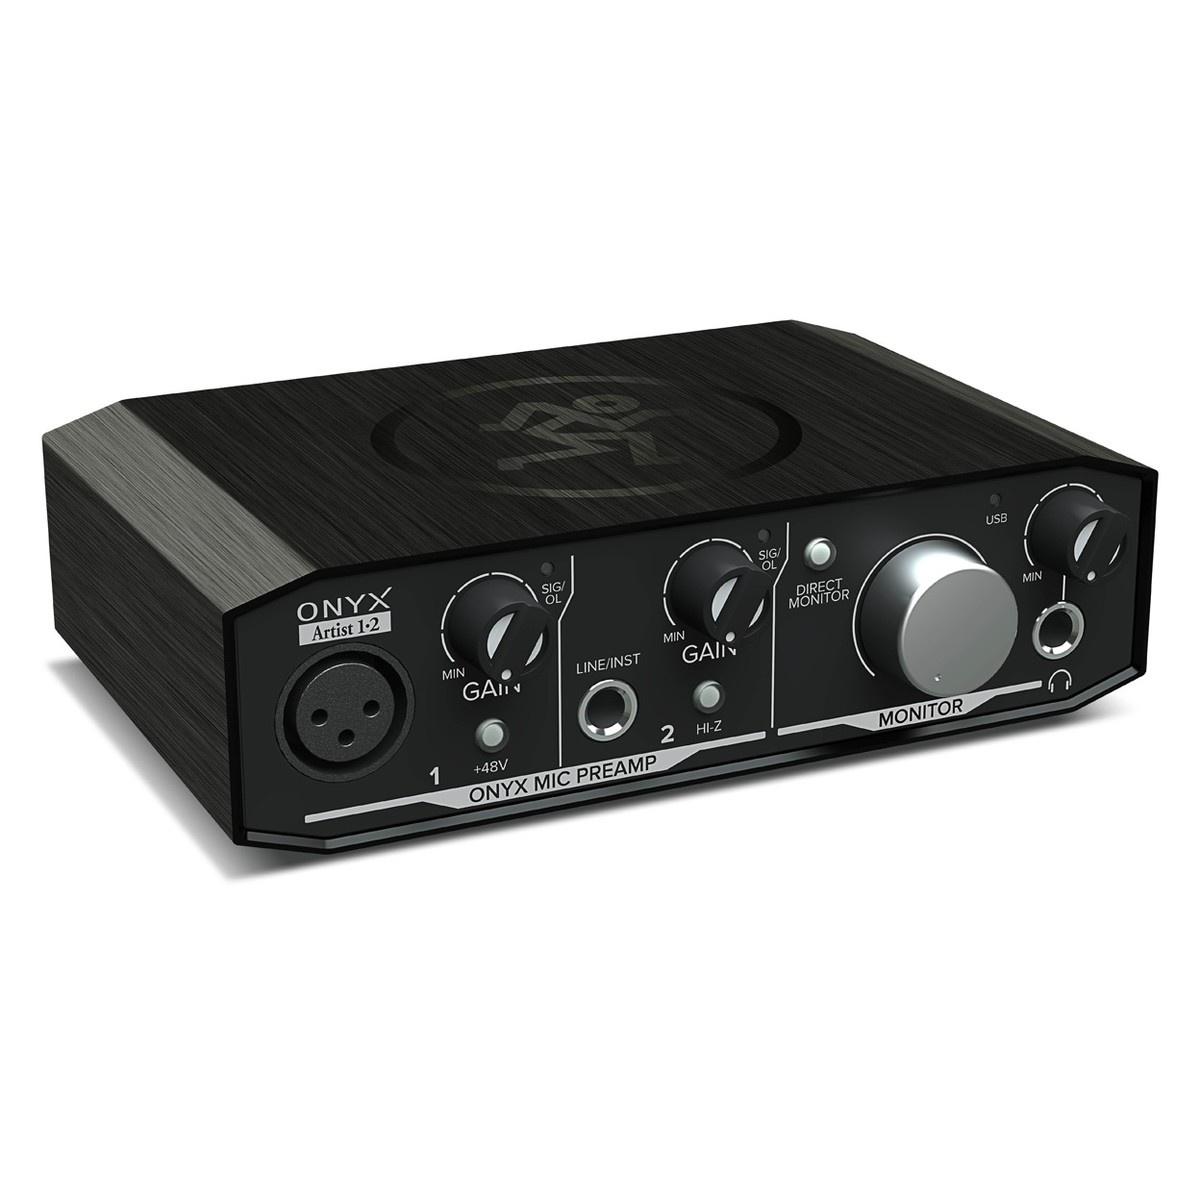 Аудиоинтерфейс Mackie Onyx Artist 1 - 2, черный аудиоинтерфейс mackie onyx producer 2•2